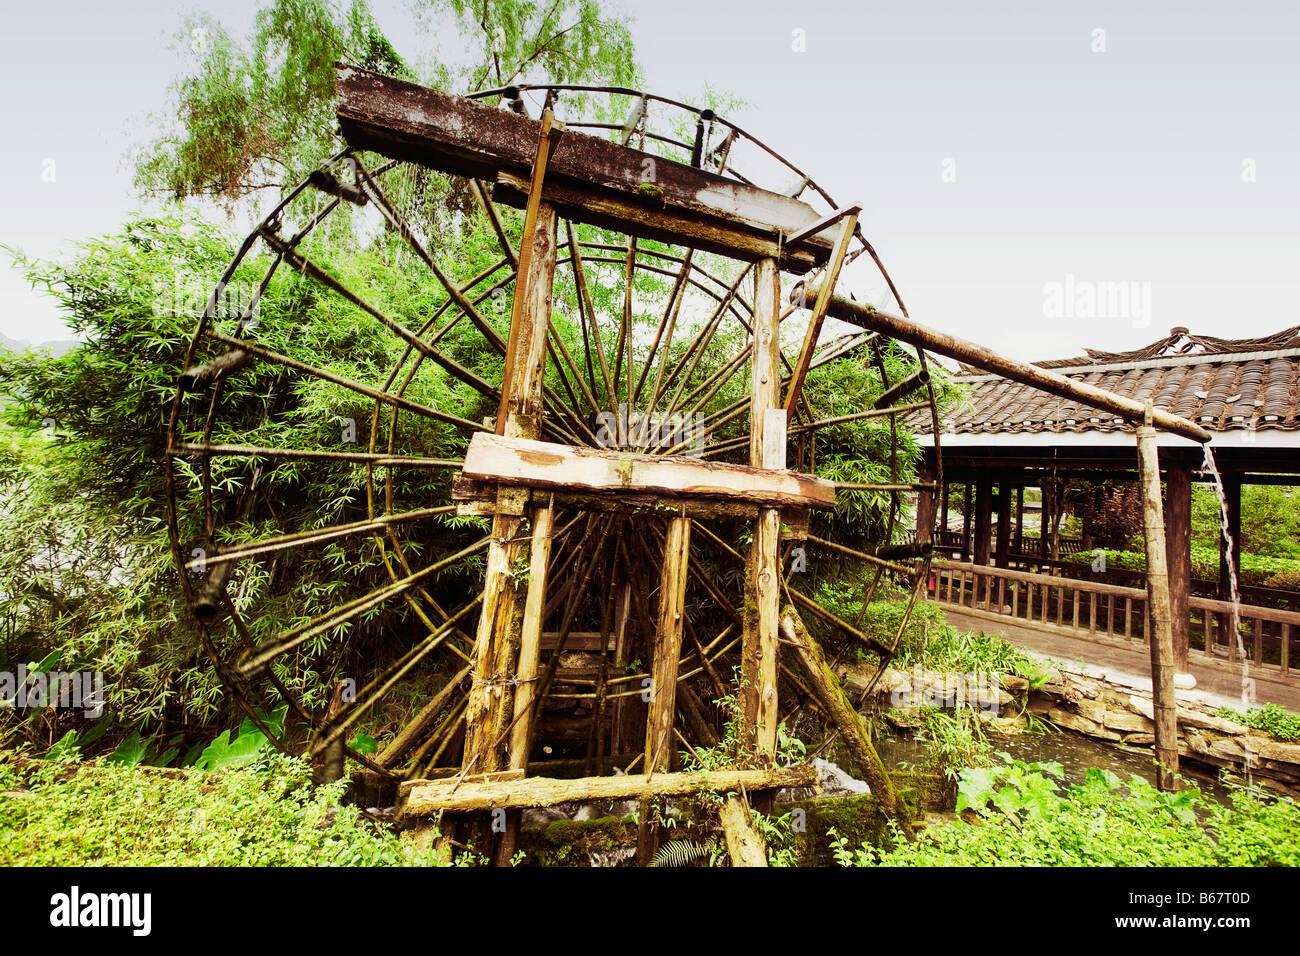 Watermill in a field, Yangshuo, Guangxi Province, China Stock Photo